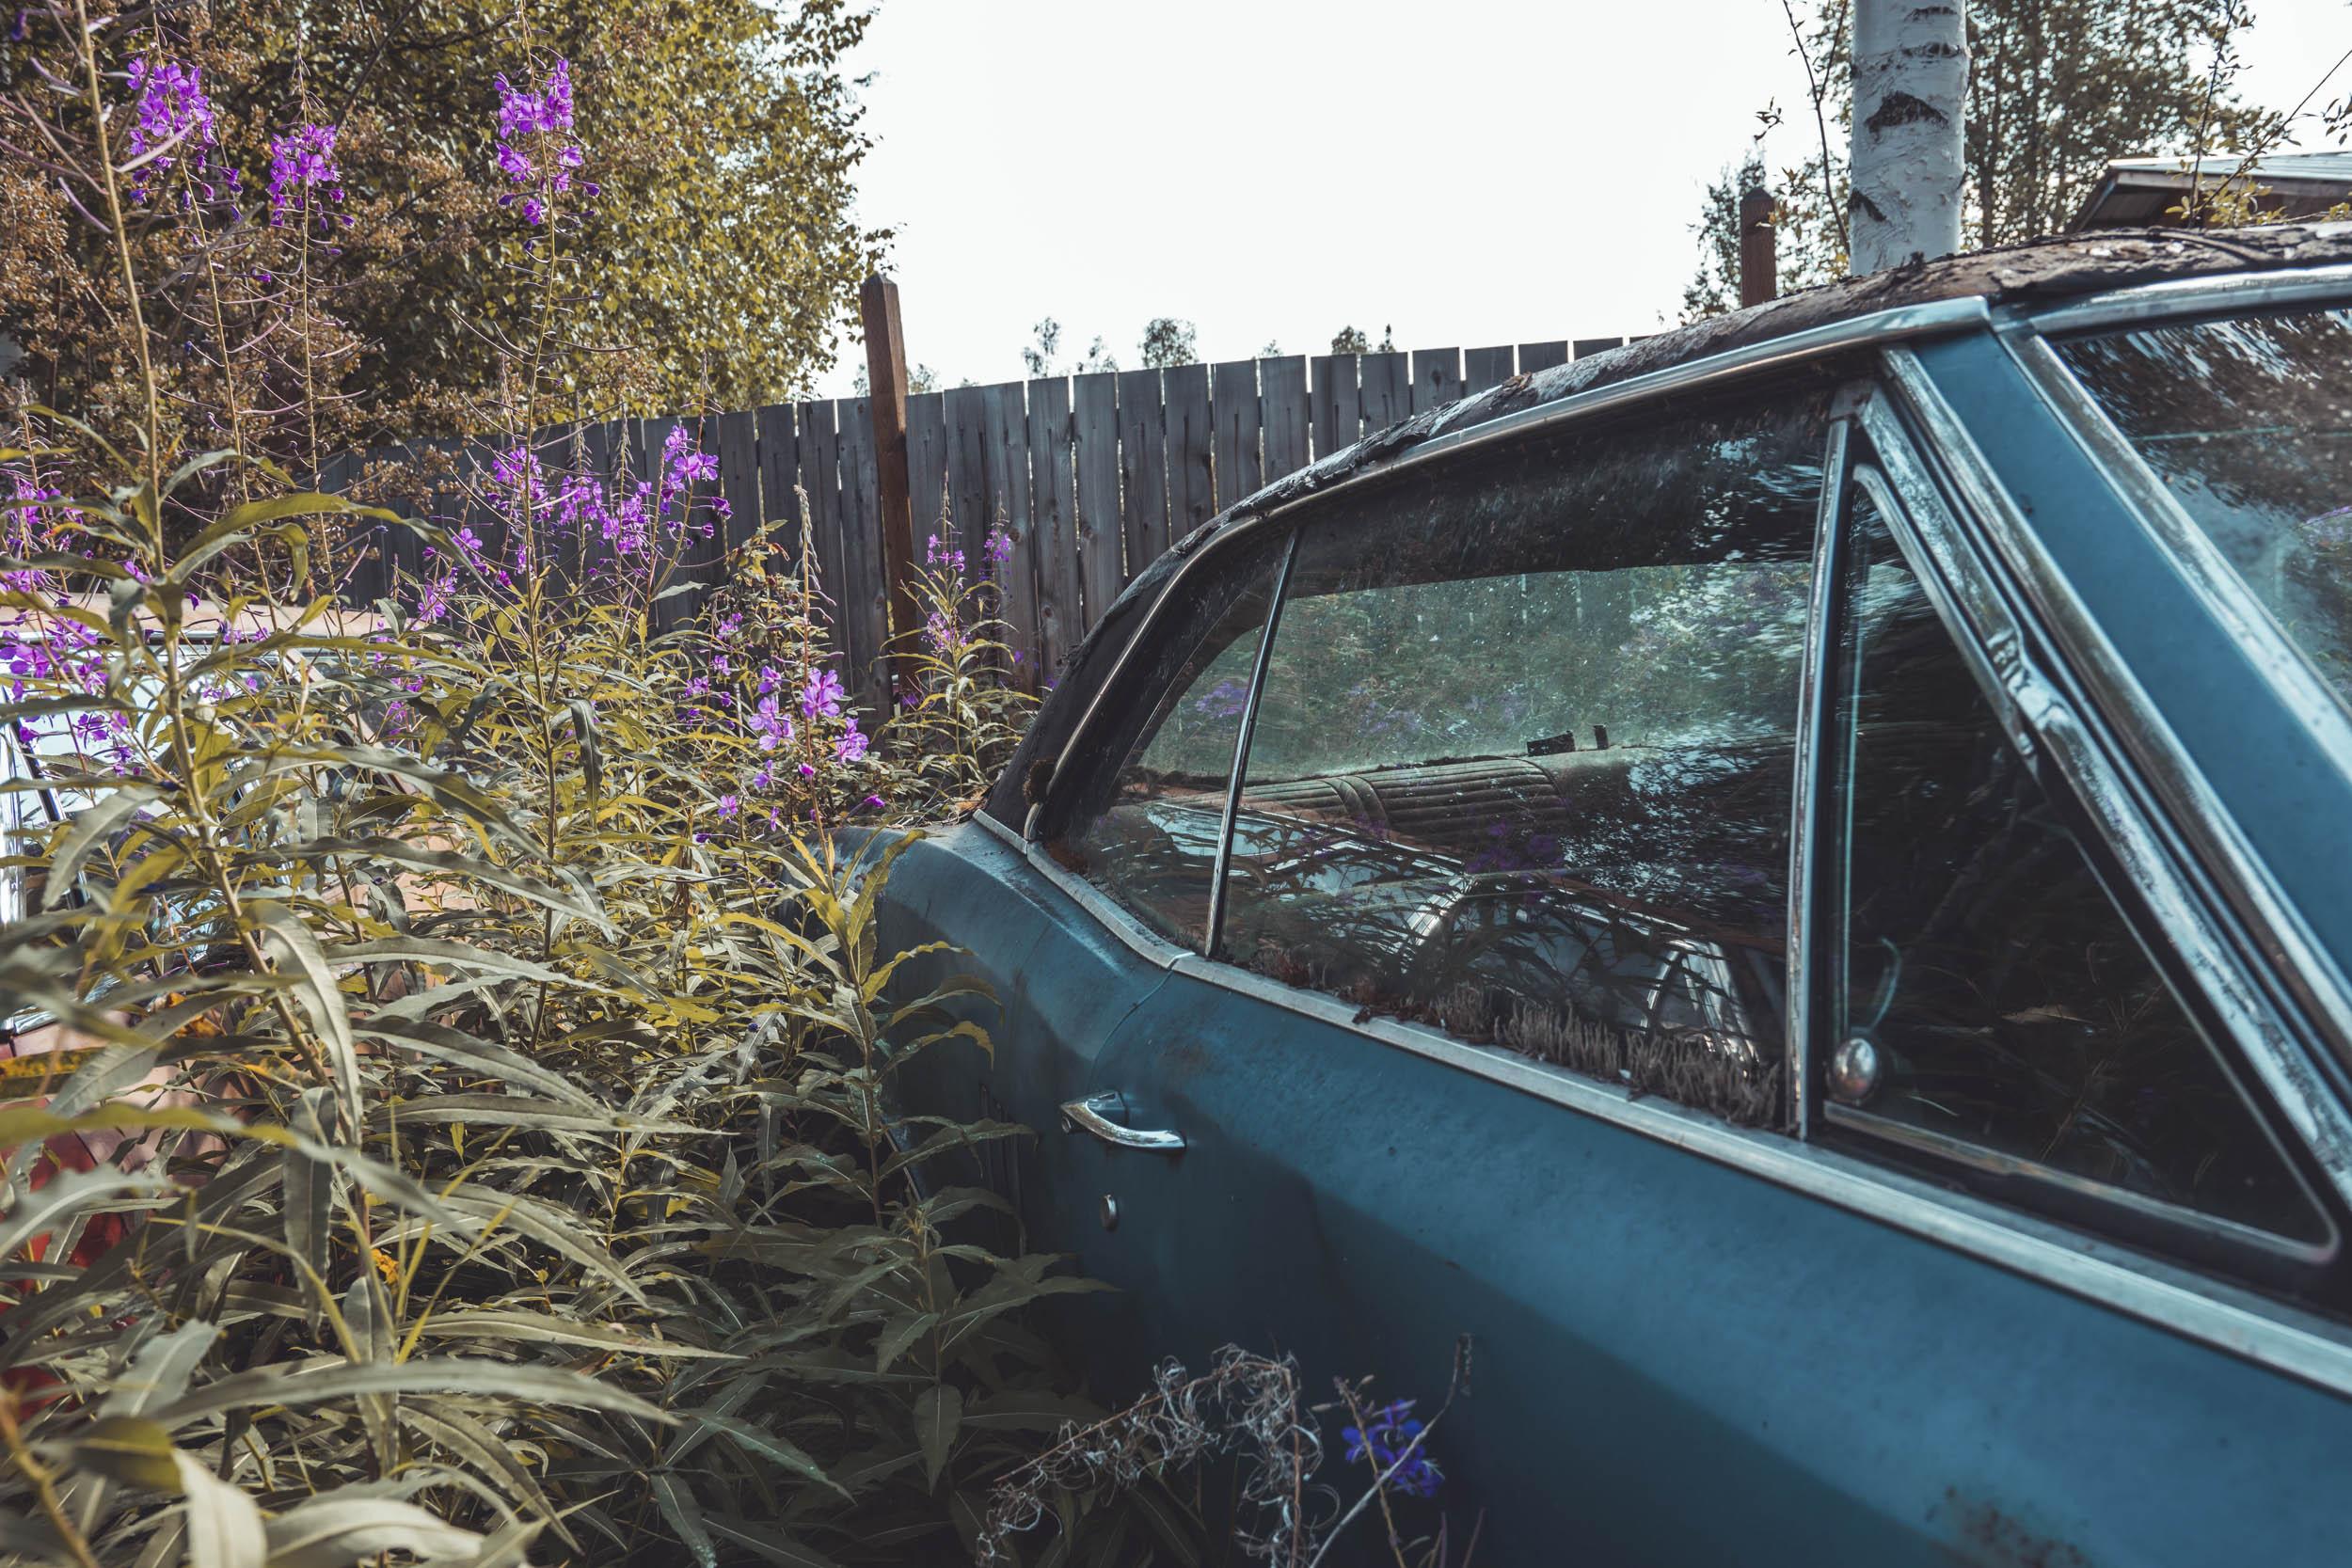 Pontiac found in a field